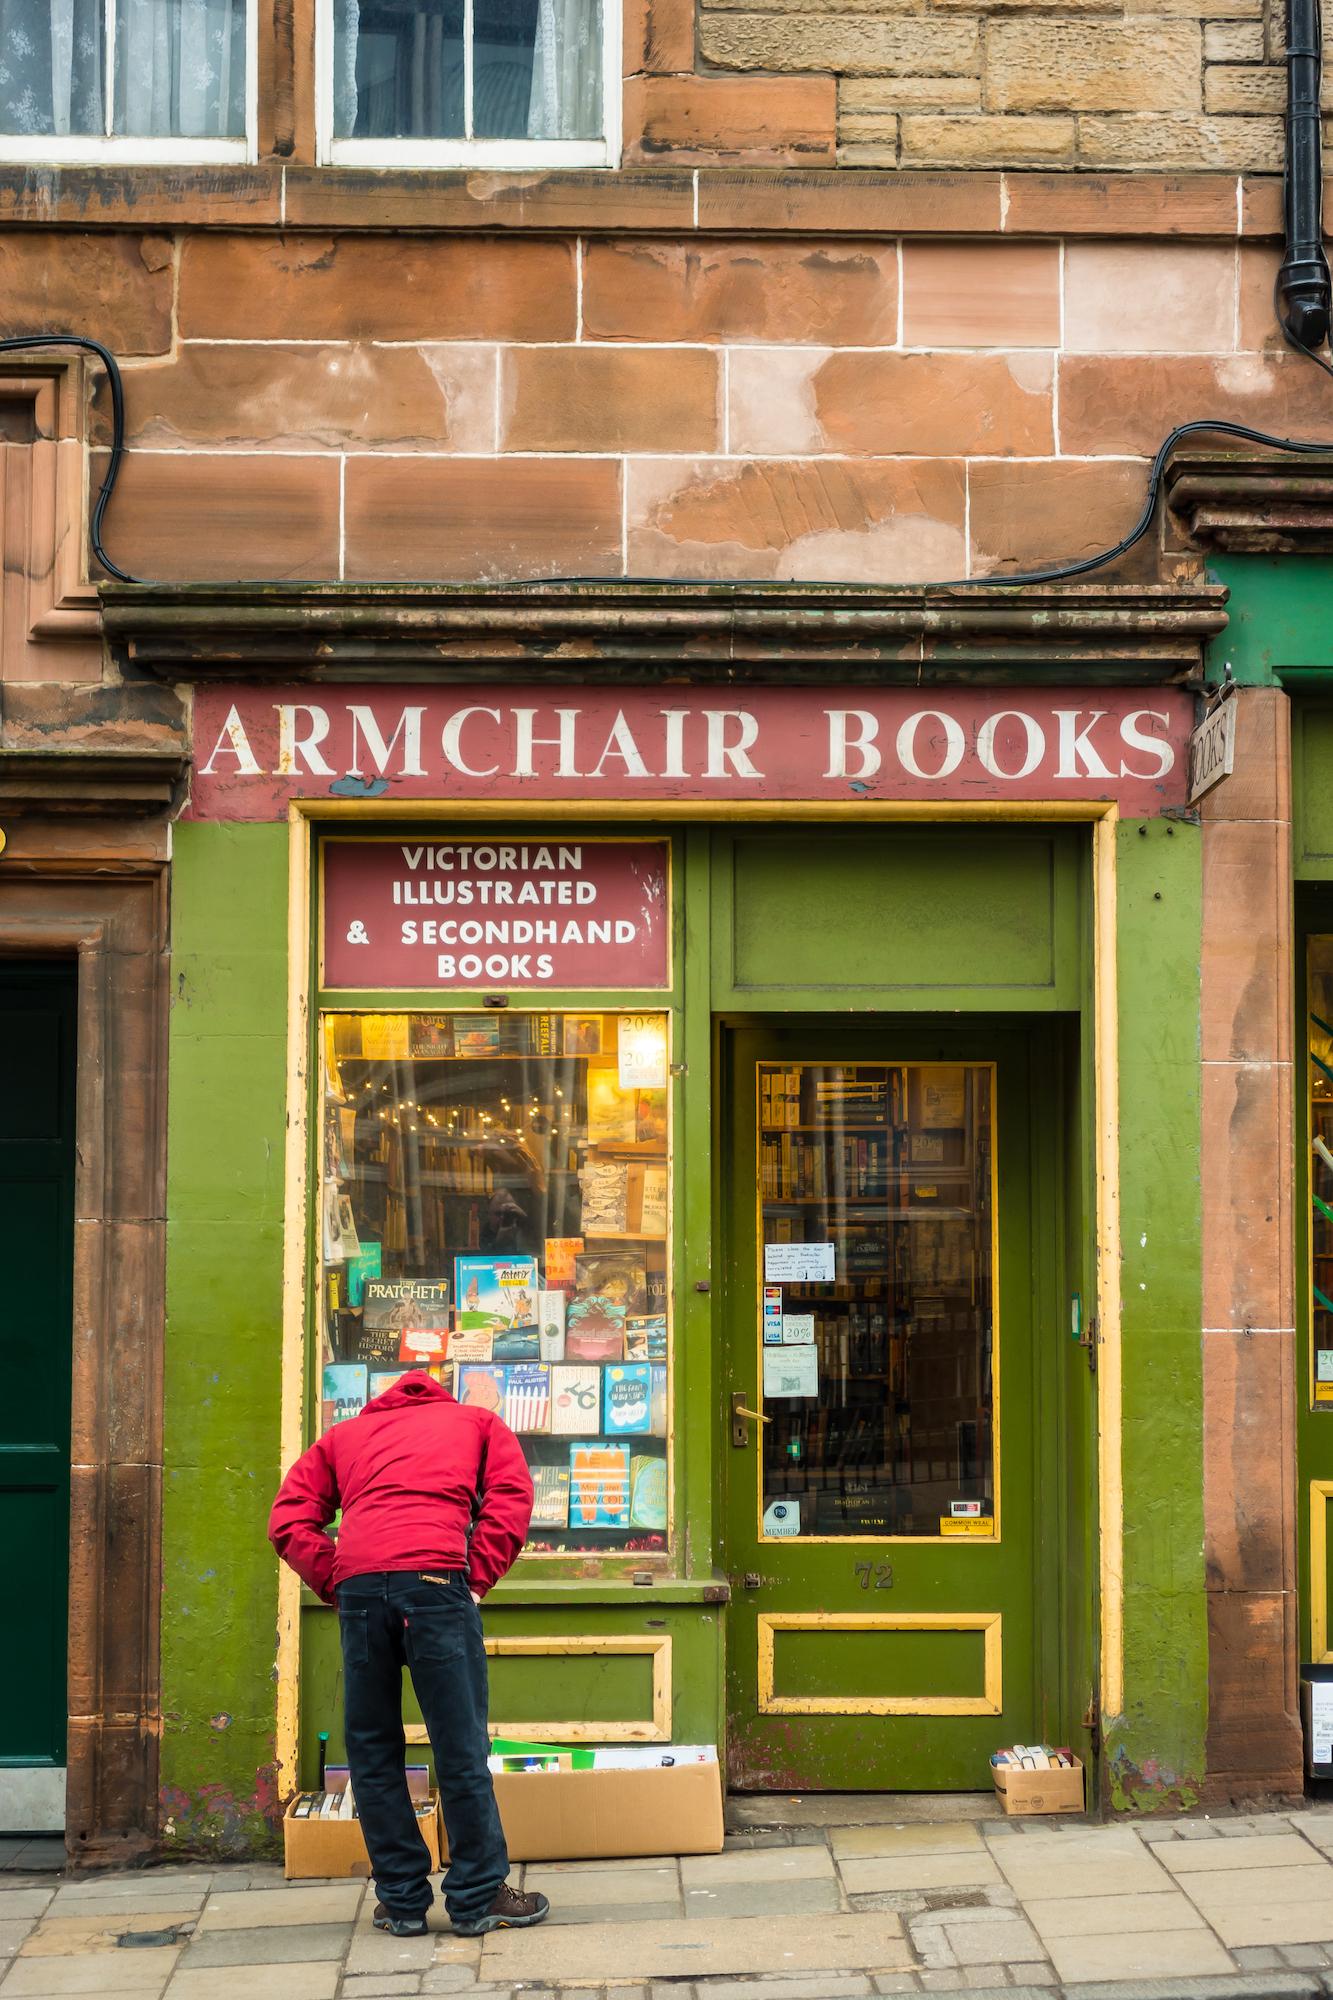 (469) Armchair Books, 72-74 West Port, Edinburgh, Scotland.jpg